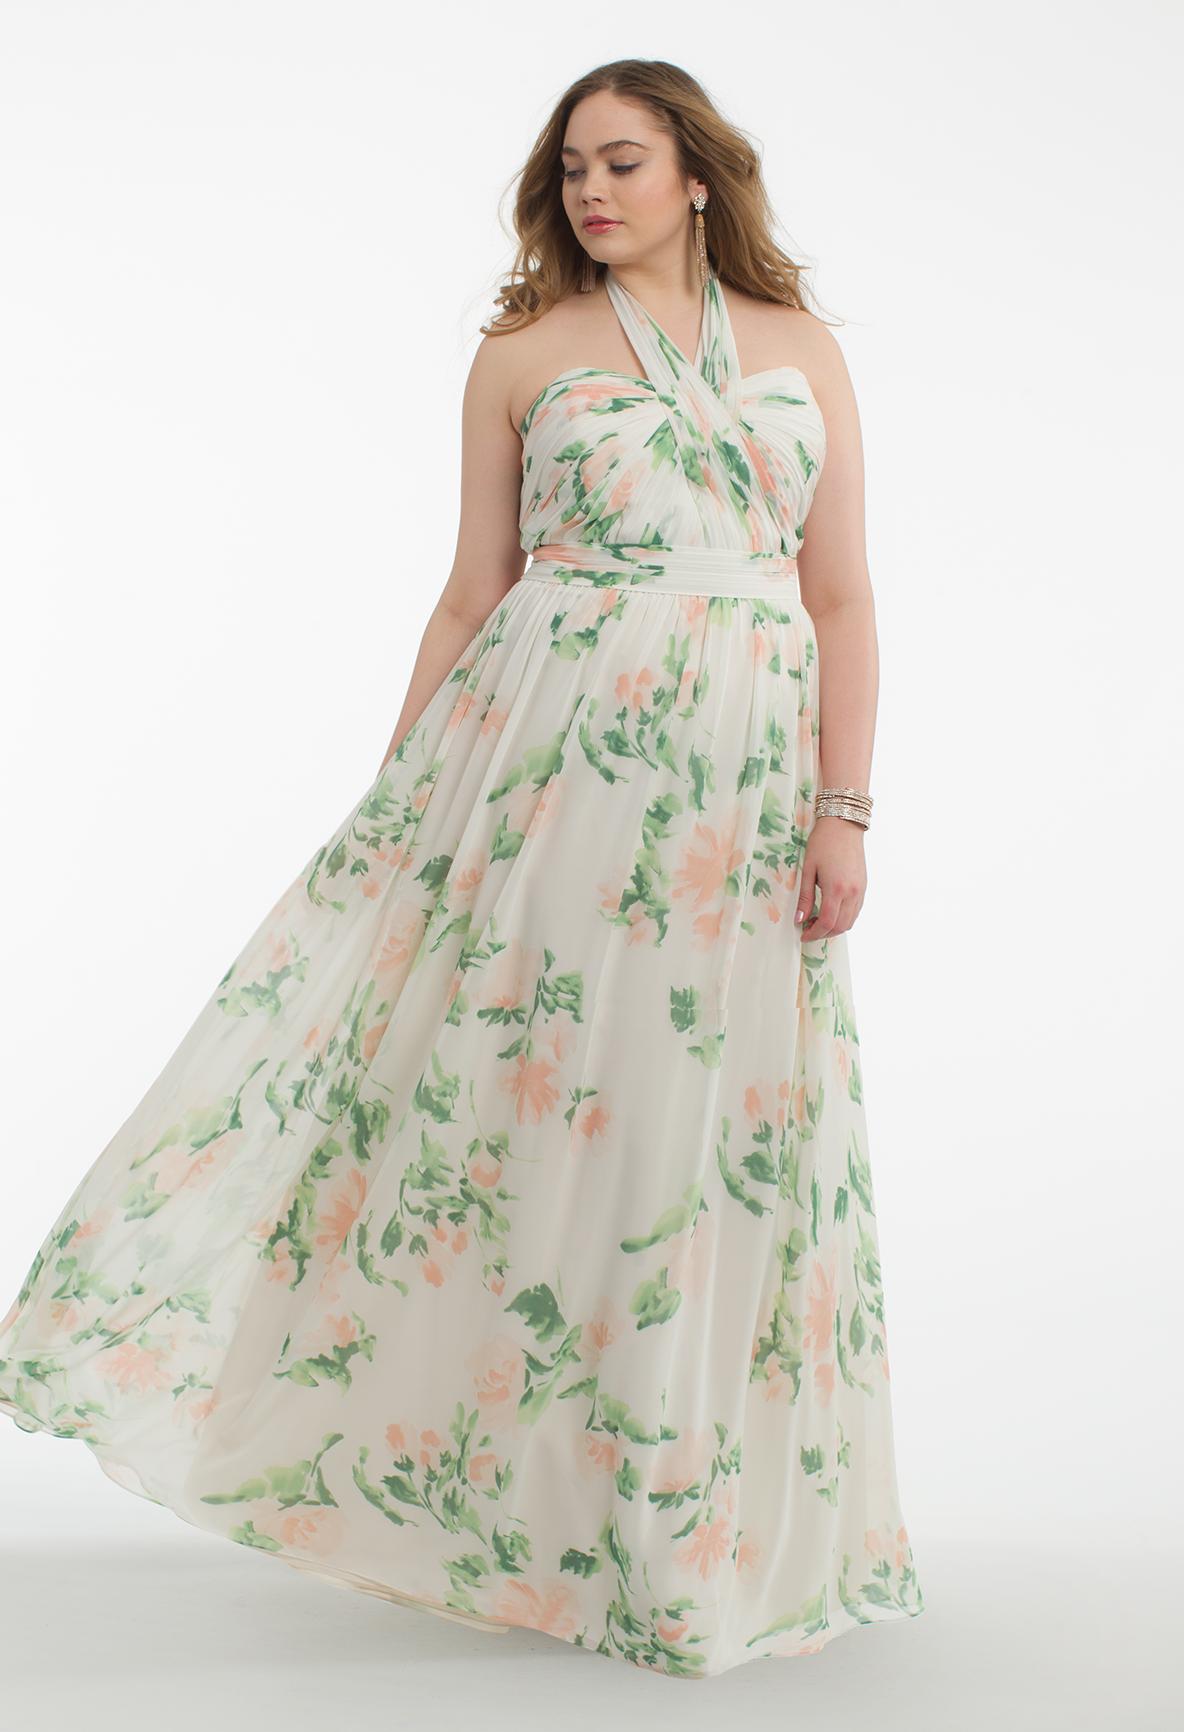 Print tie neck halter dress floral bridesmaid dresses bridal